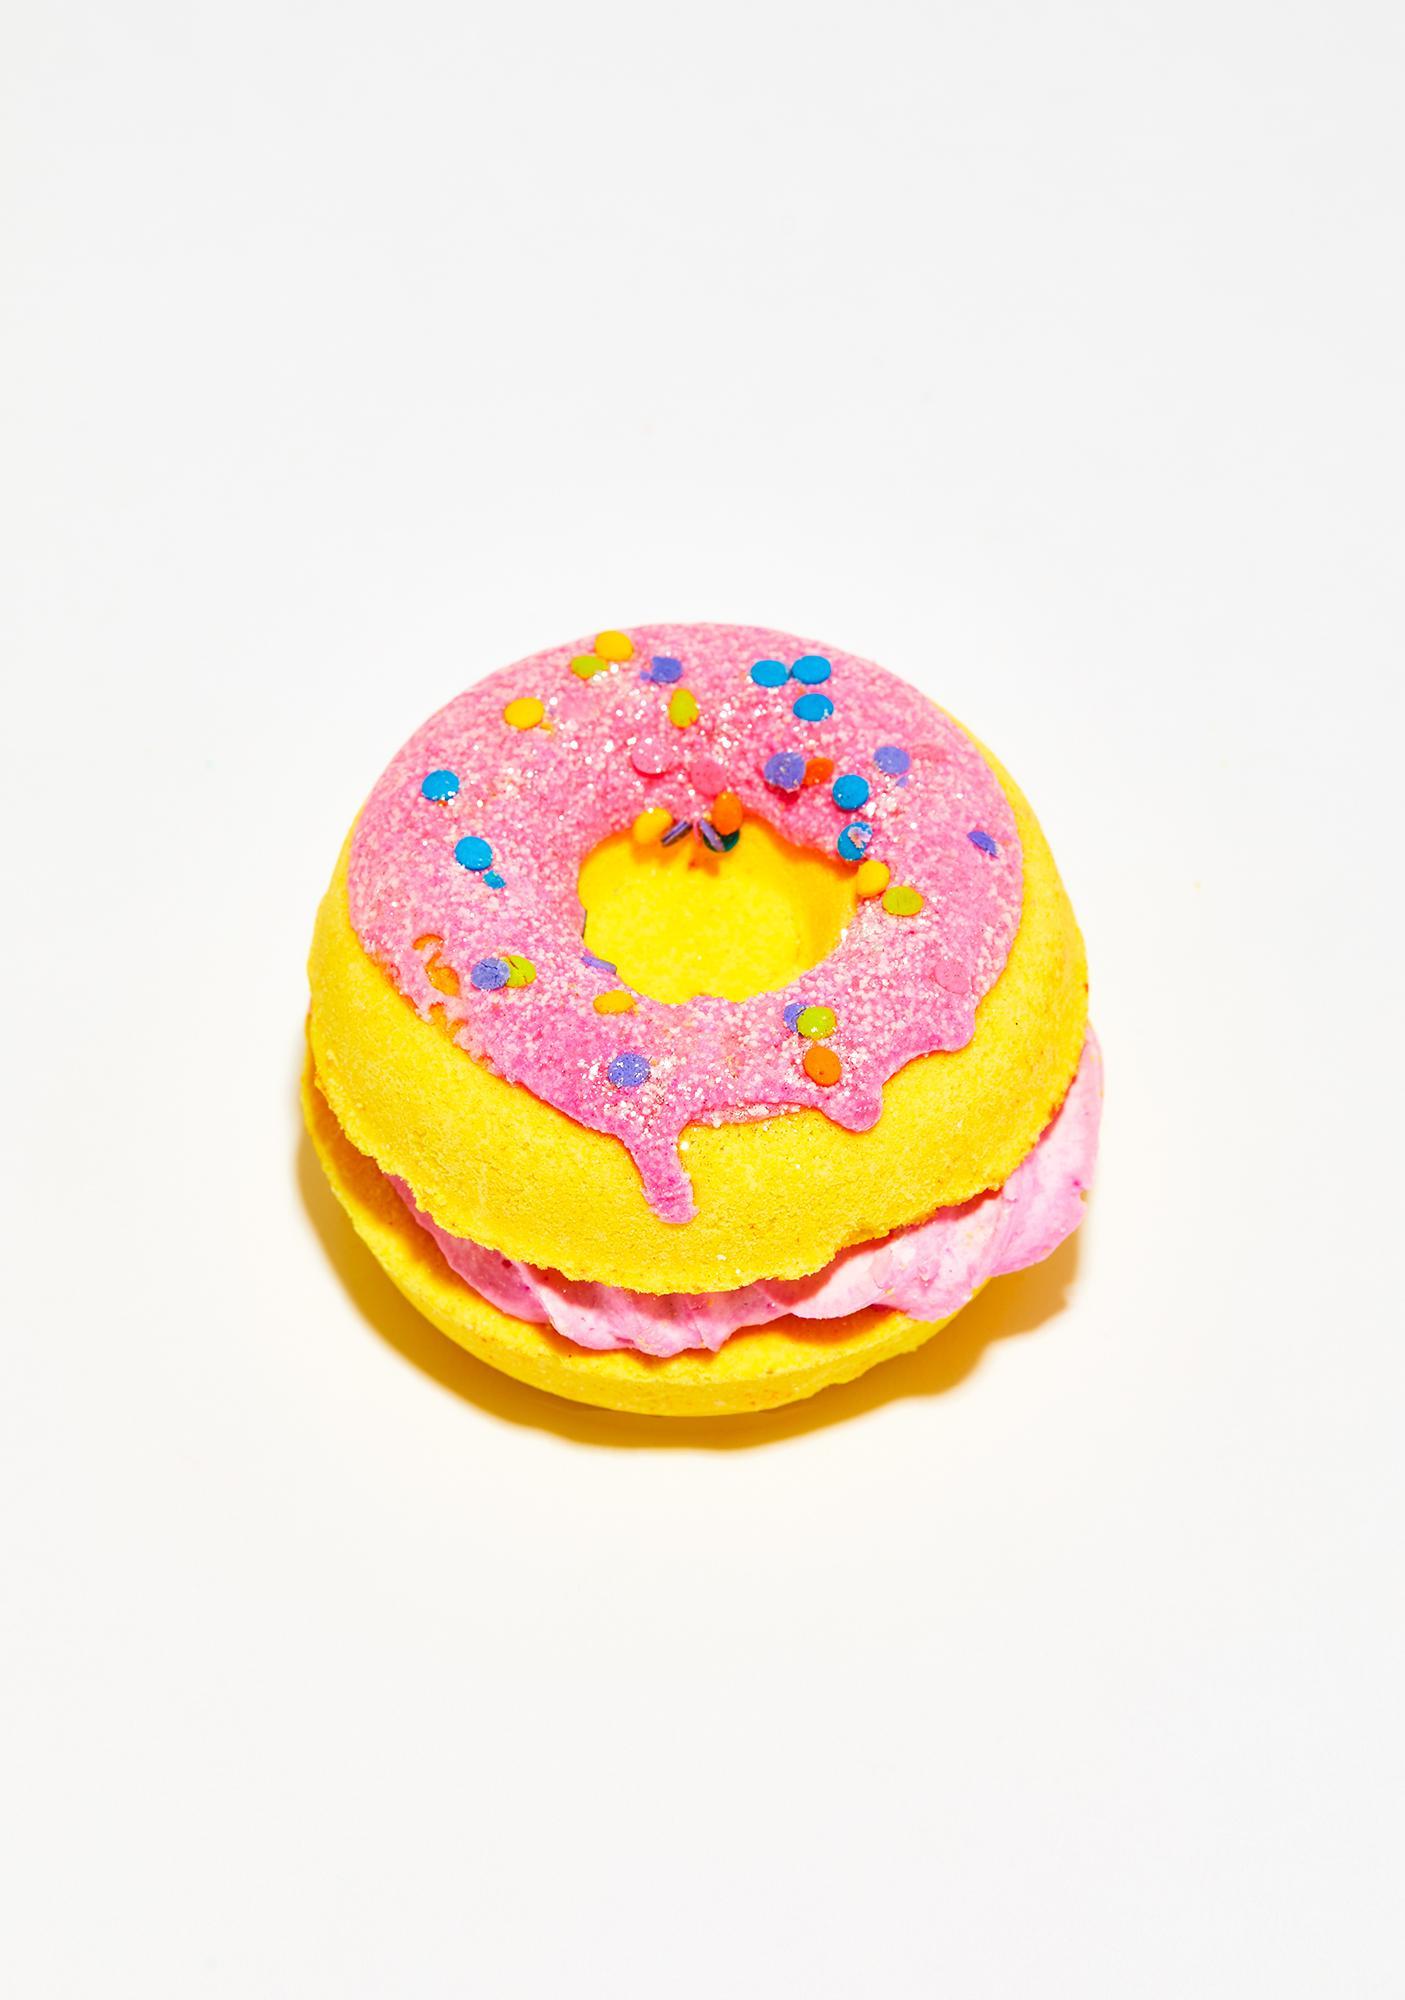 New York's Bathhouse Fruit Loops Donut Sandwich Bath Bomb